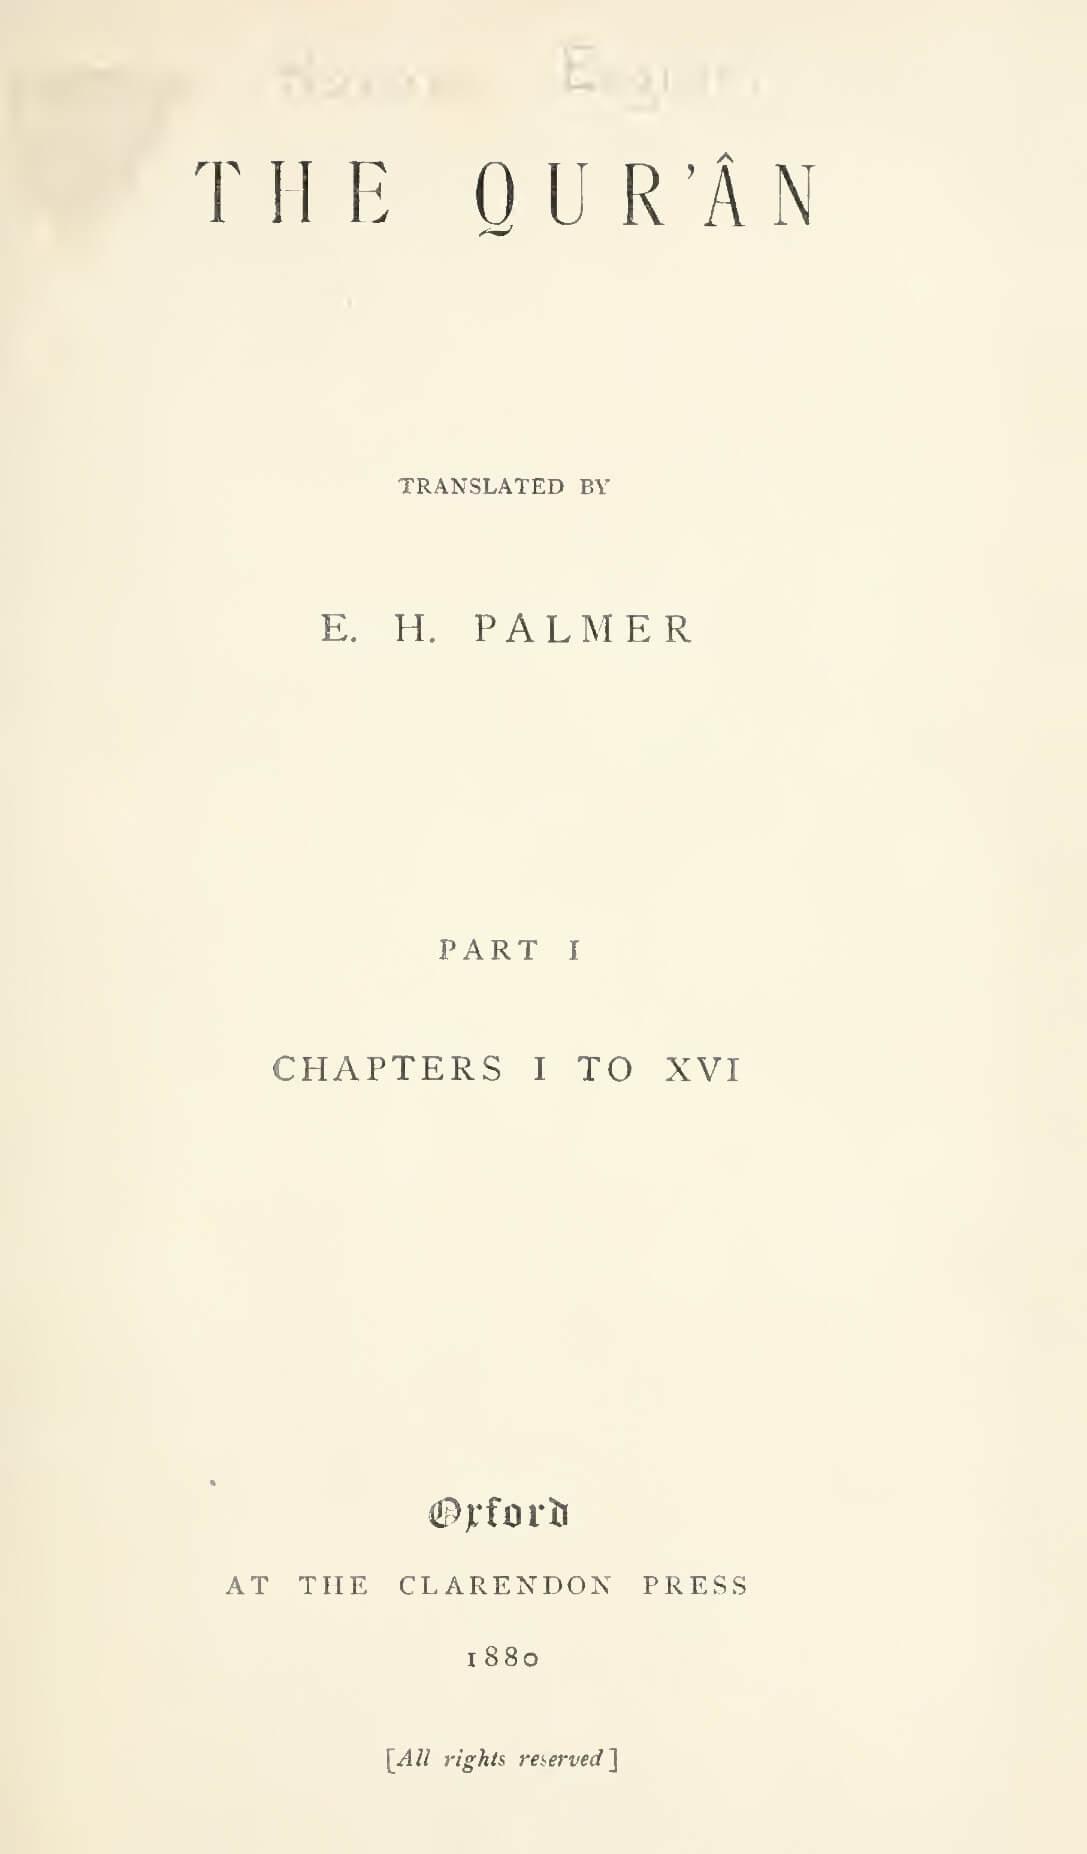 Edward Palmer 1880 Quran Explorer, Page 2